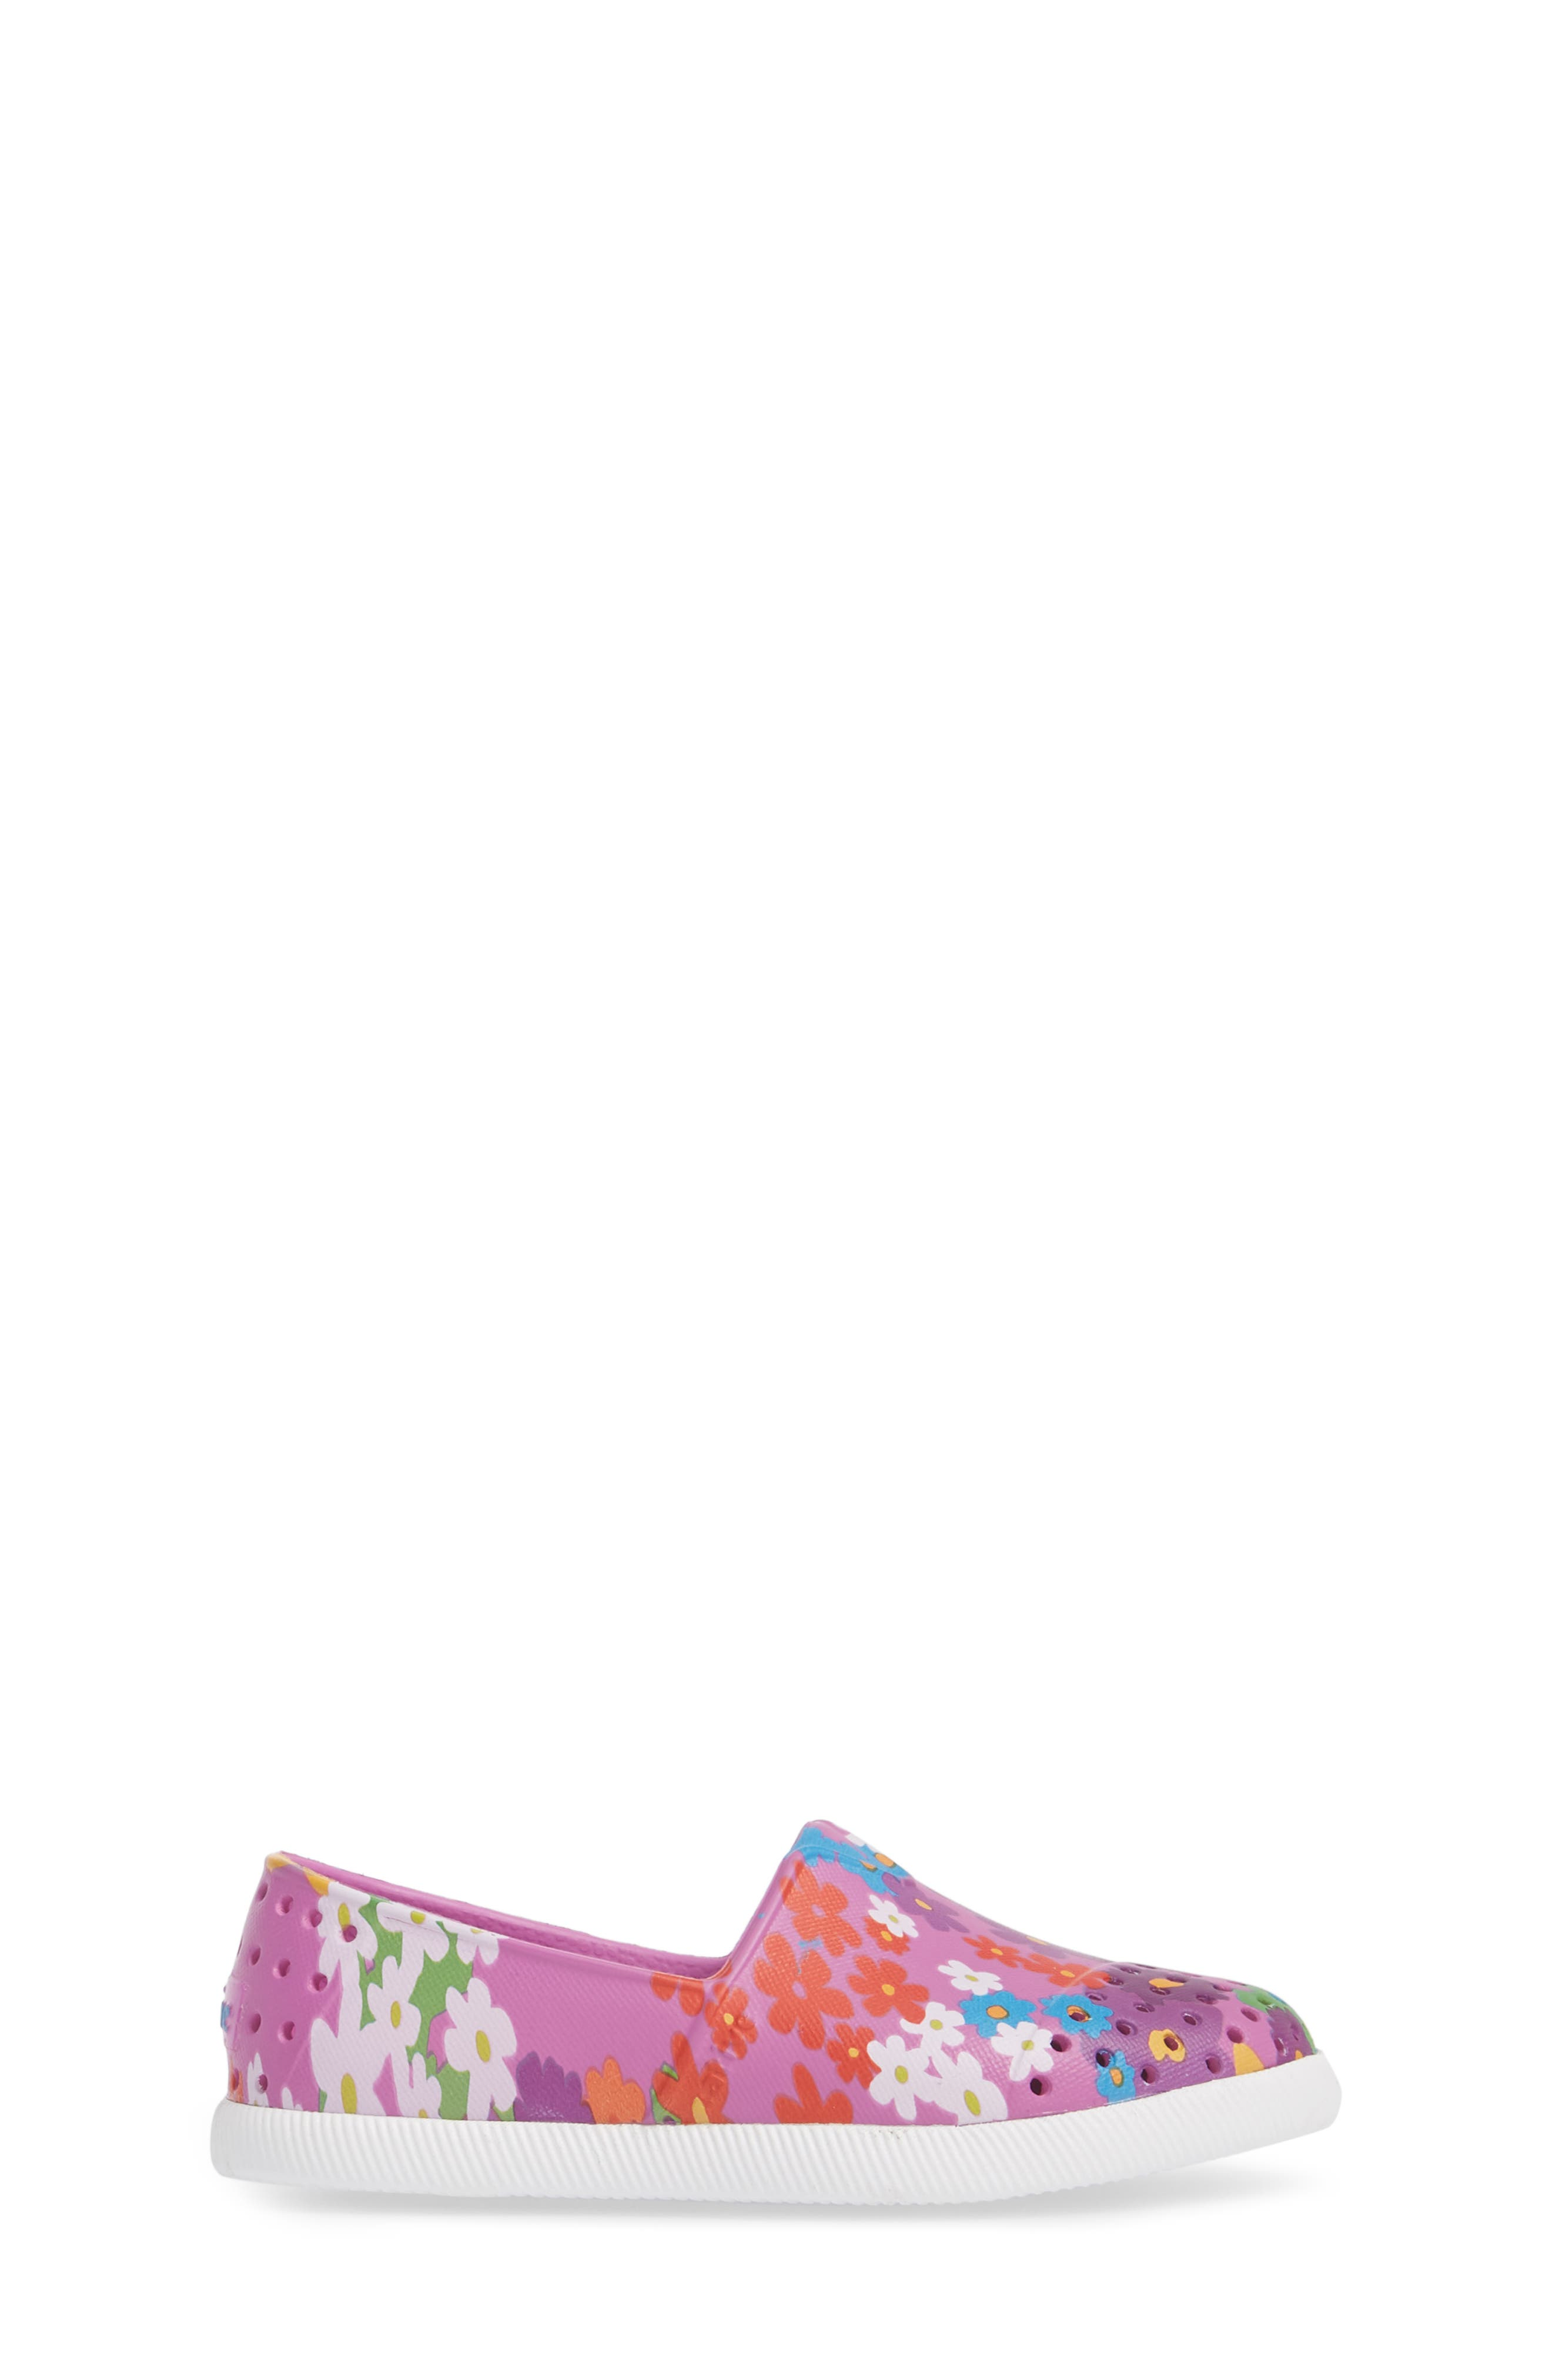 Verona Perforated Slip-On,                             Alternate thumbnail 3, color,                             Peace Purple/ White/ Daisy